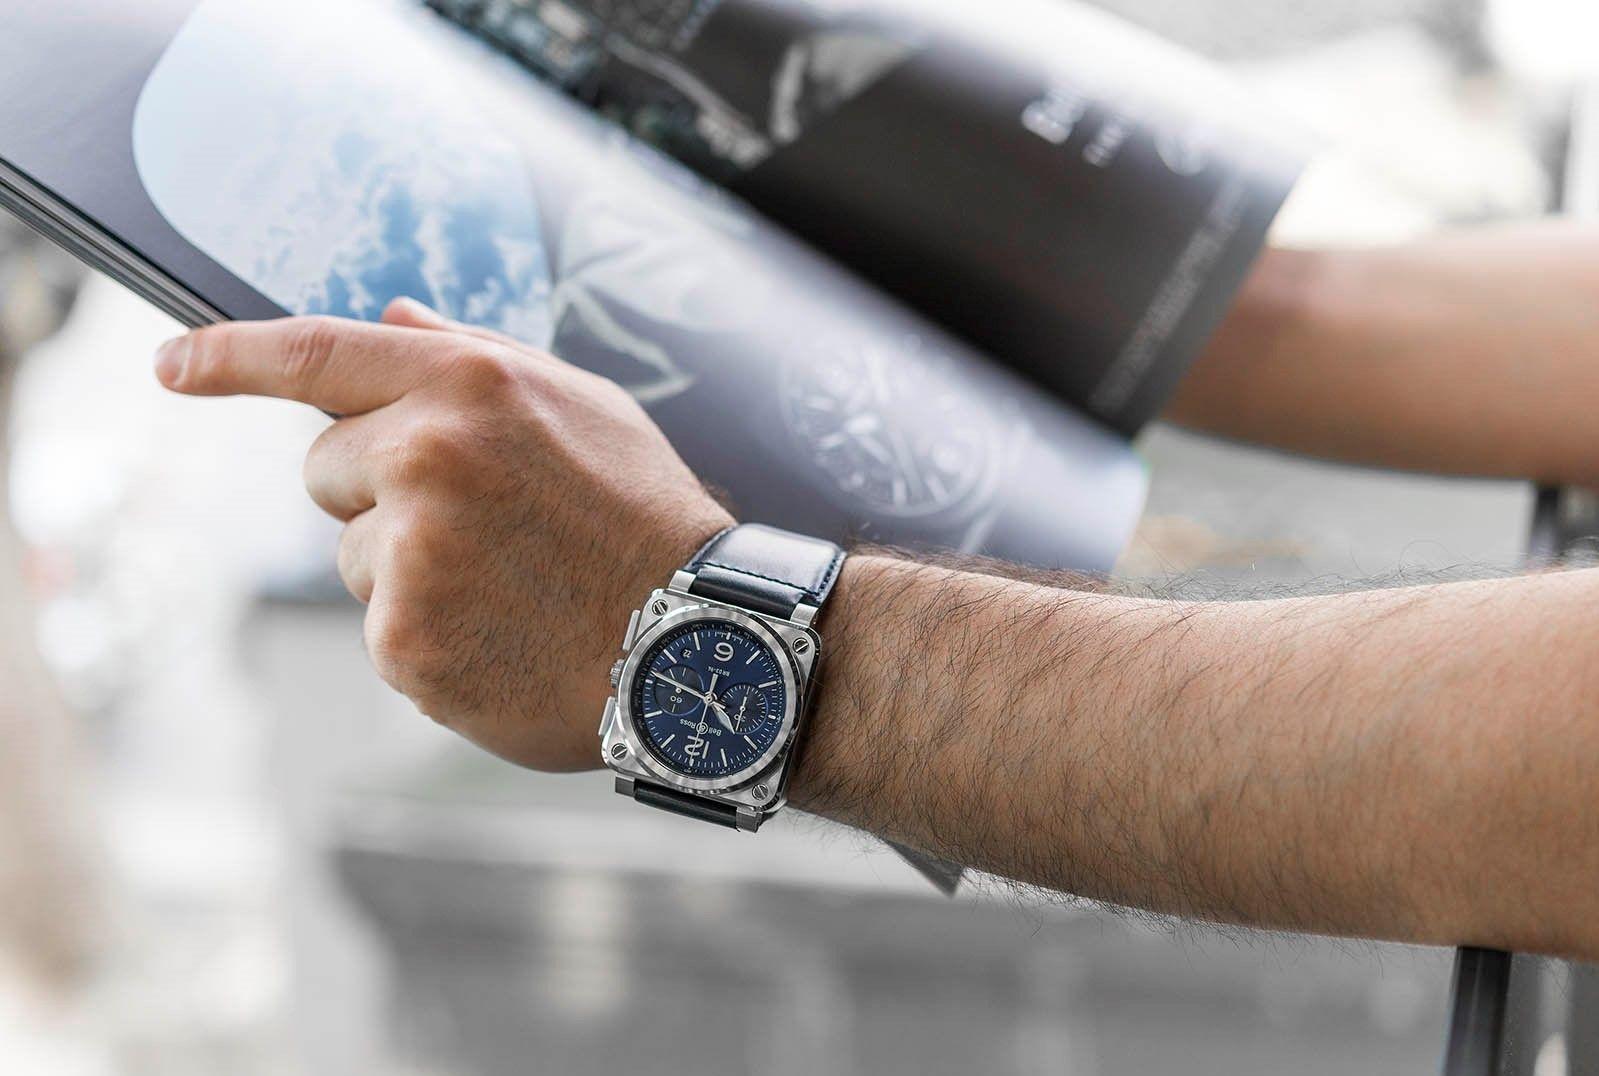 db547b55b Letecké pánské hodinky Bell & Ross Blue Steel☑ -Datumovka -Chronograph  -Safírové sklo